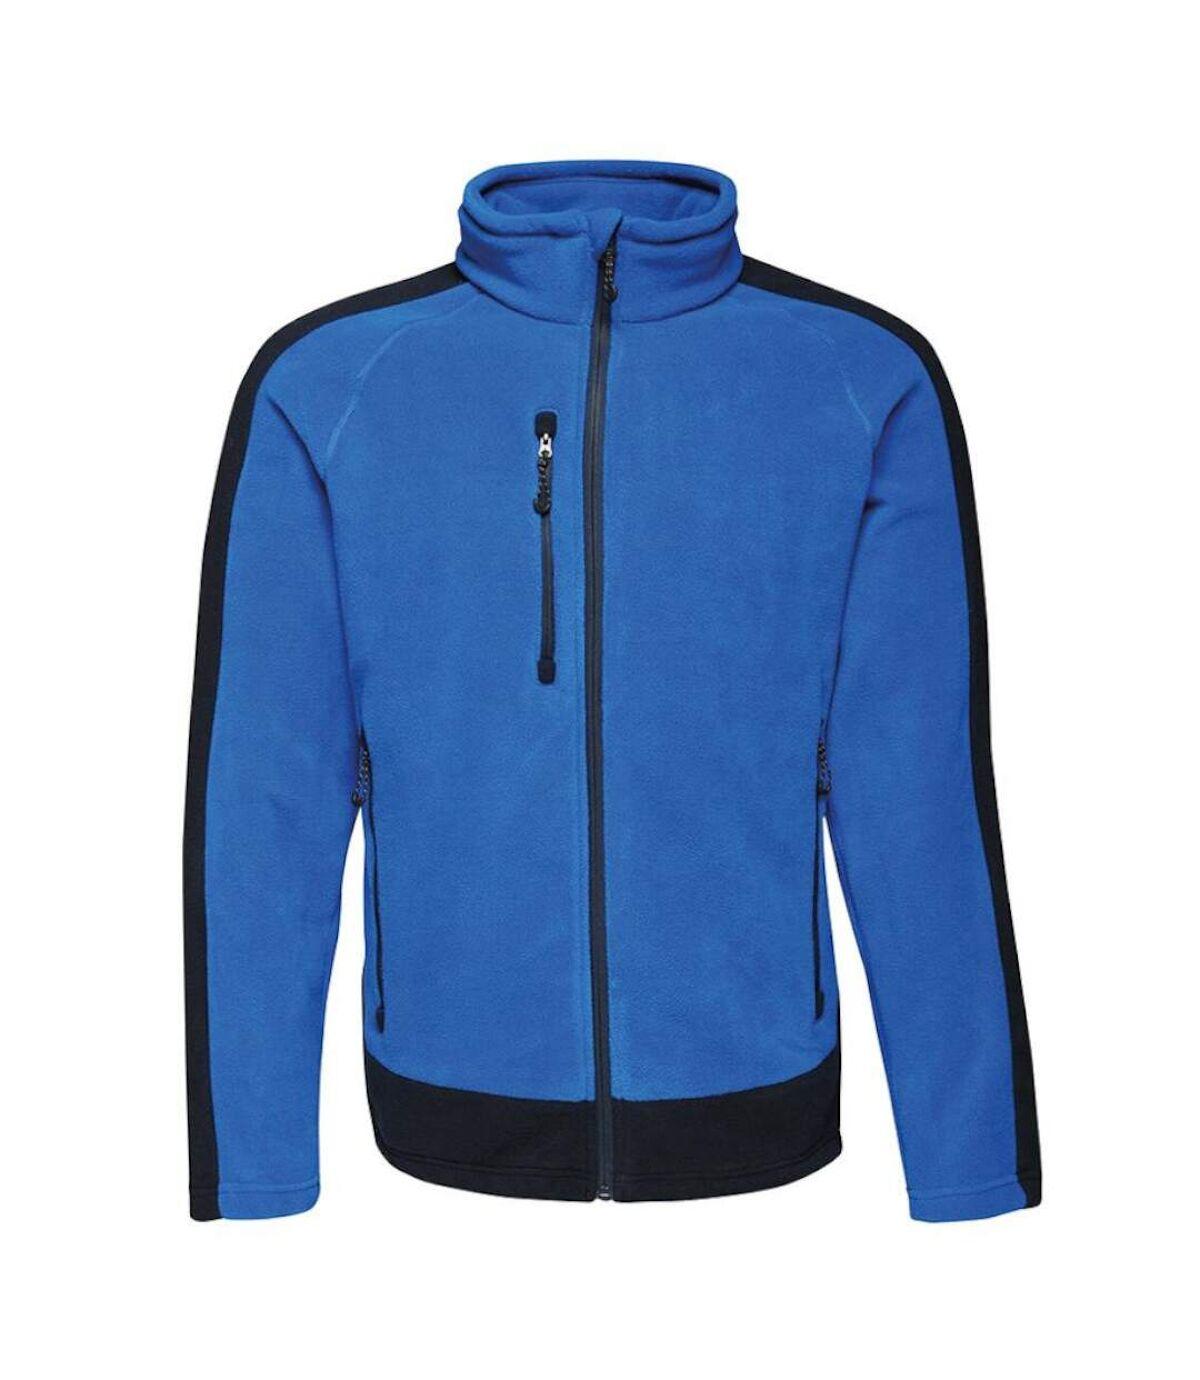 Regatta - Polaire CONTRAST 300 - Homme (Bleu roi / bleu marine) - UTPC3319